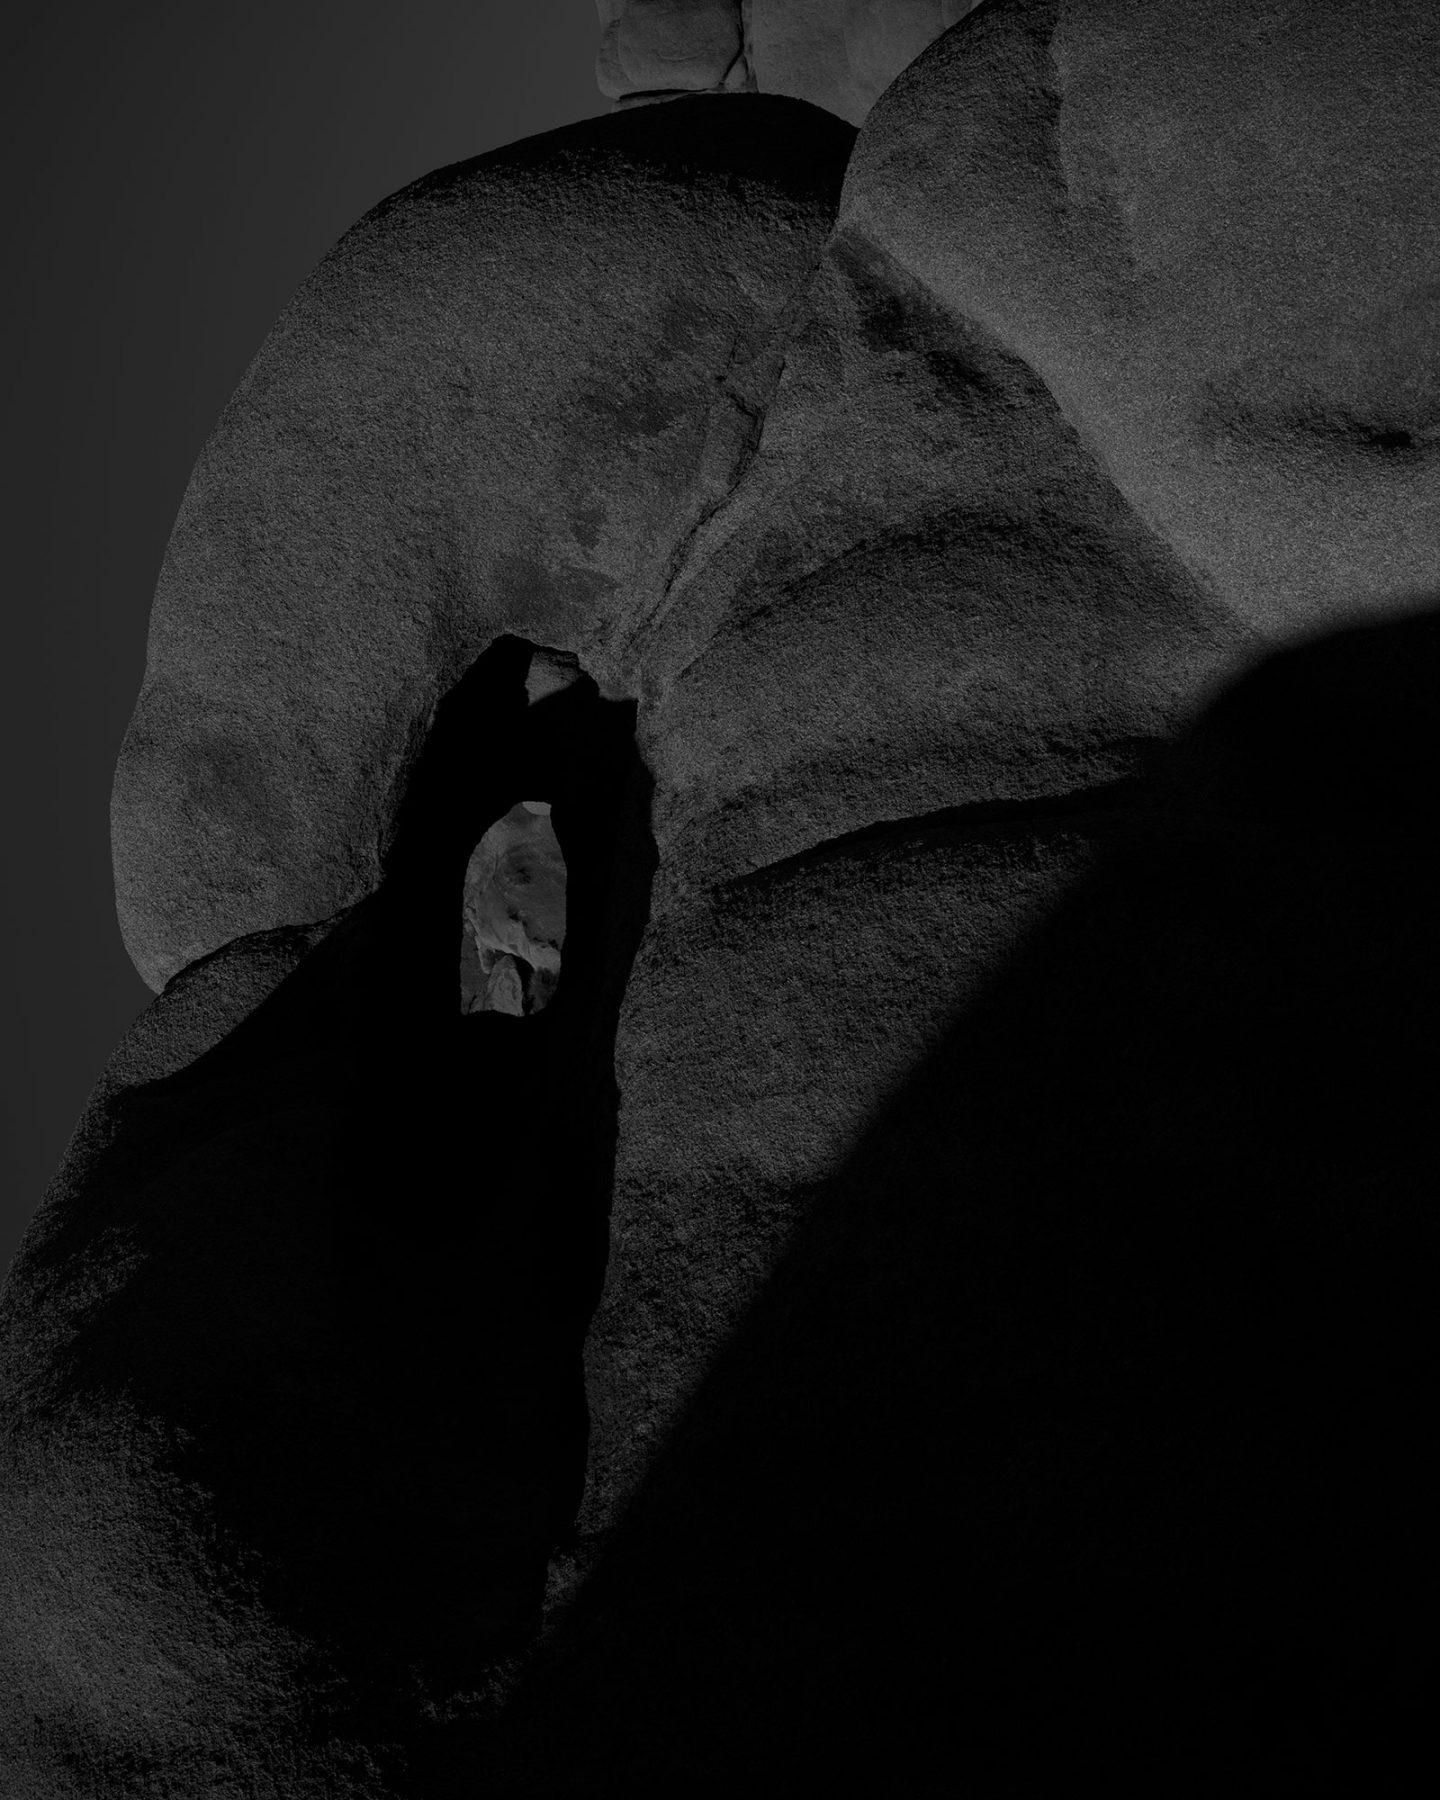 IGNANT-Photography-MarcusSchaefer-15